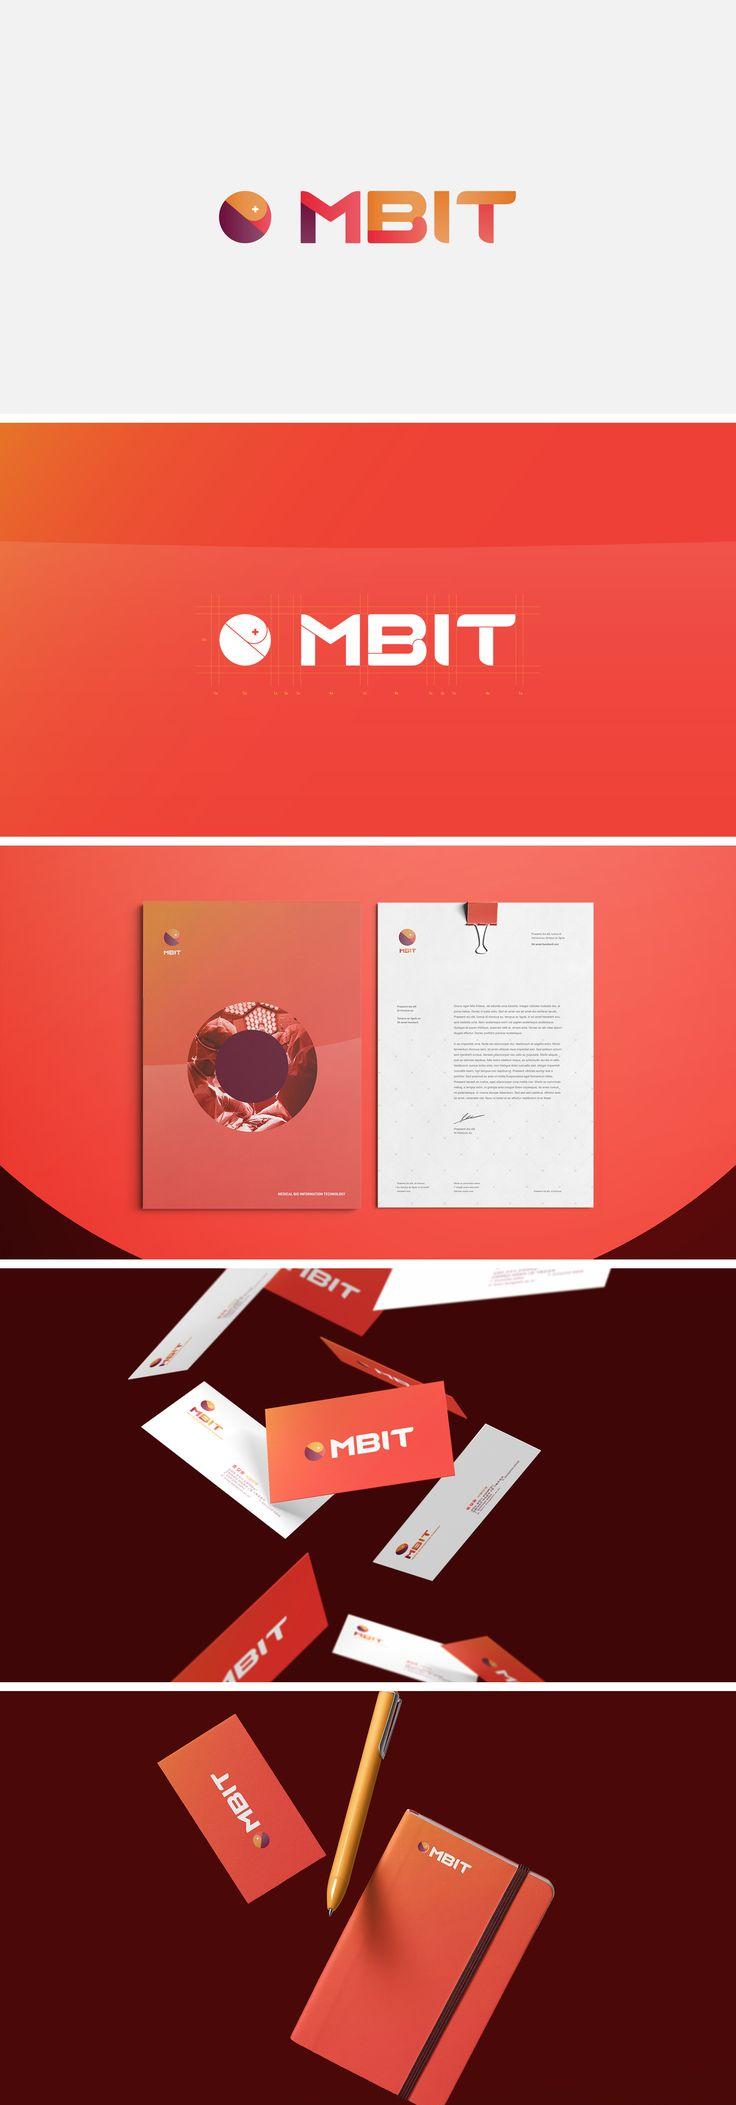 MBIT Brand Identity - MBIT 브랜드 아이덴티티 개발 by. studio Half8 #identity #logo #branding #academylogo #universitylogo